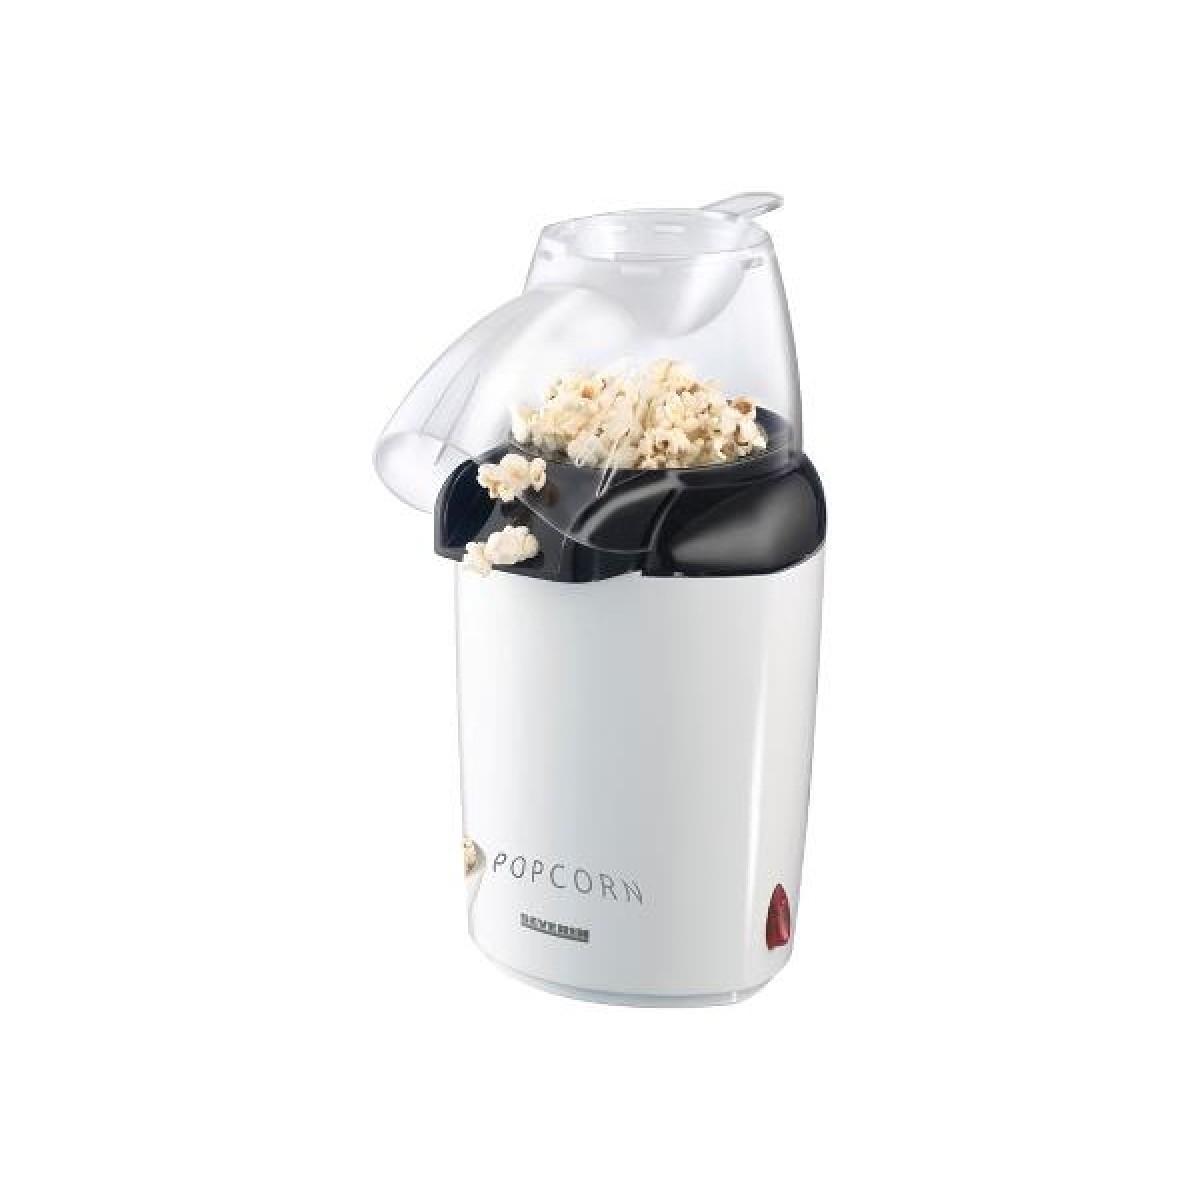 SEVERIN Popcornmaskine 1200W hvid